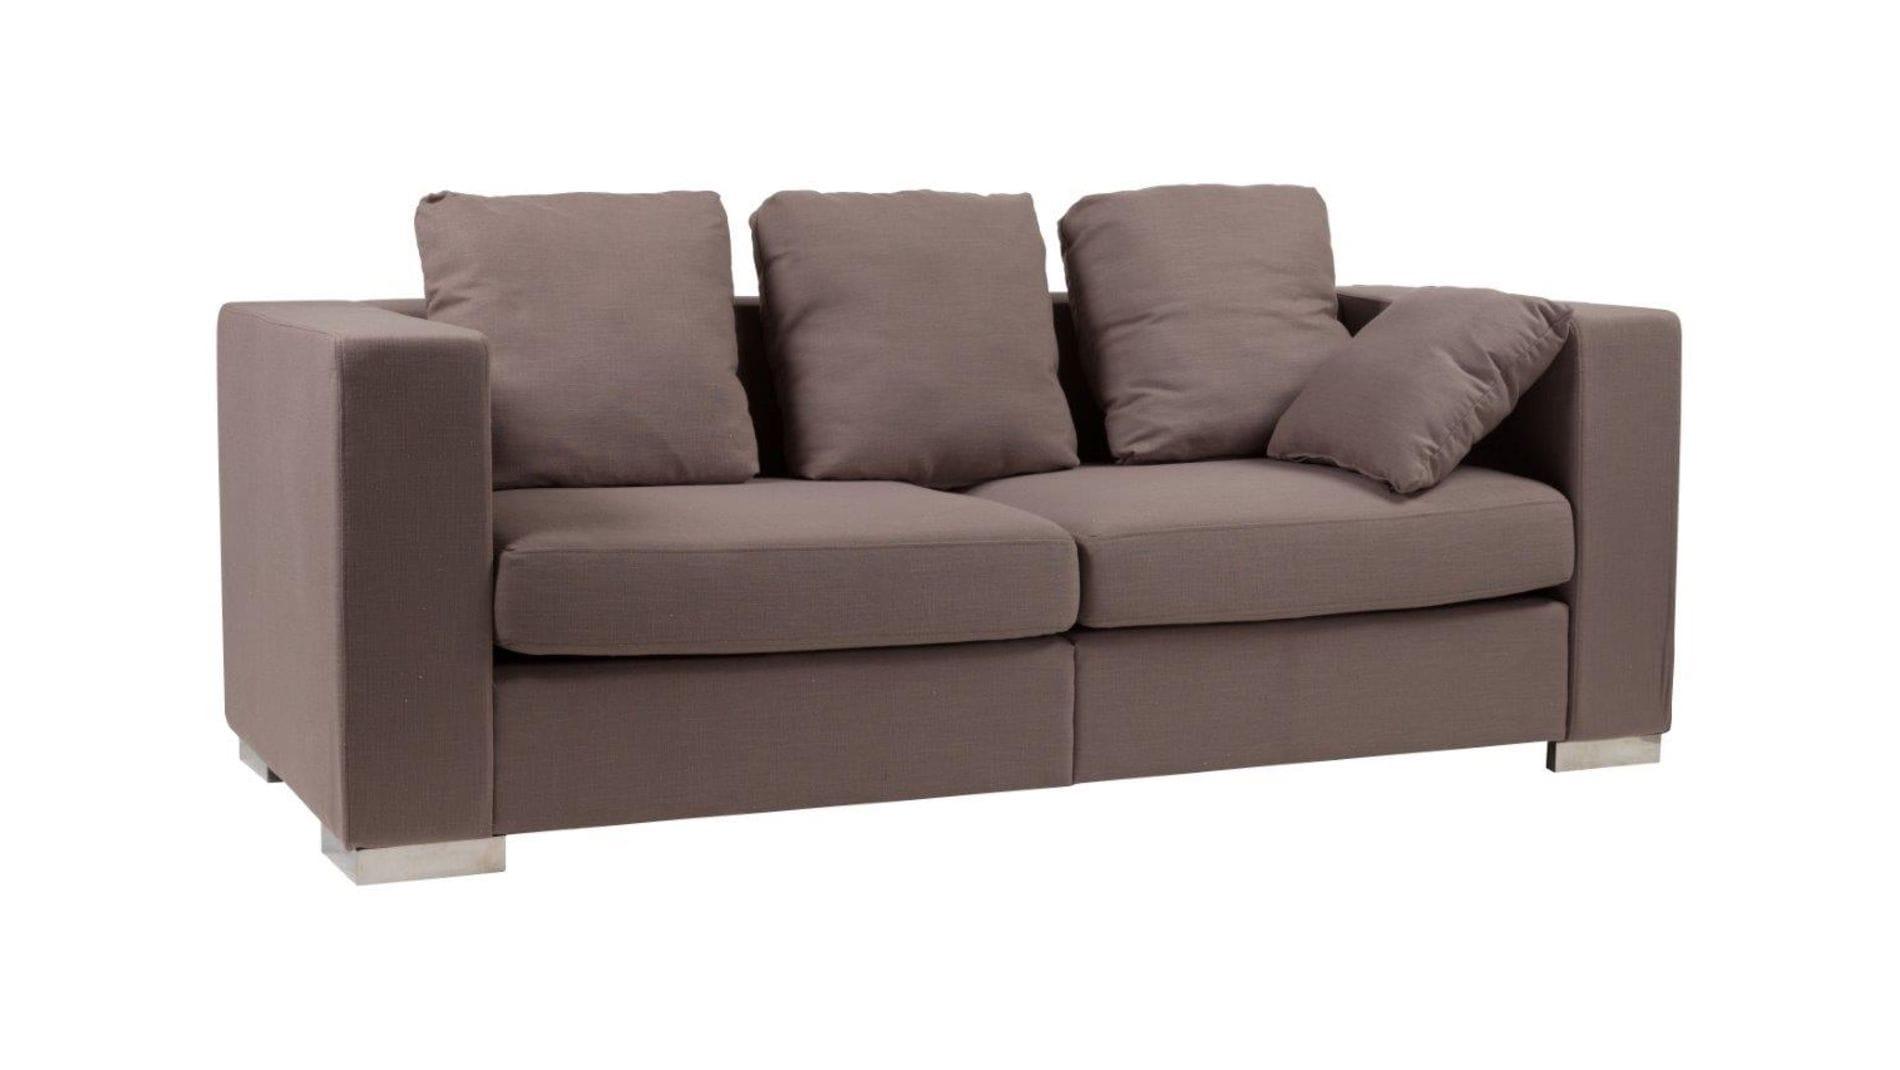 Диван Maturelli Sofa Coffe